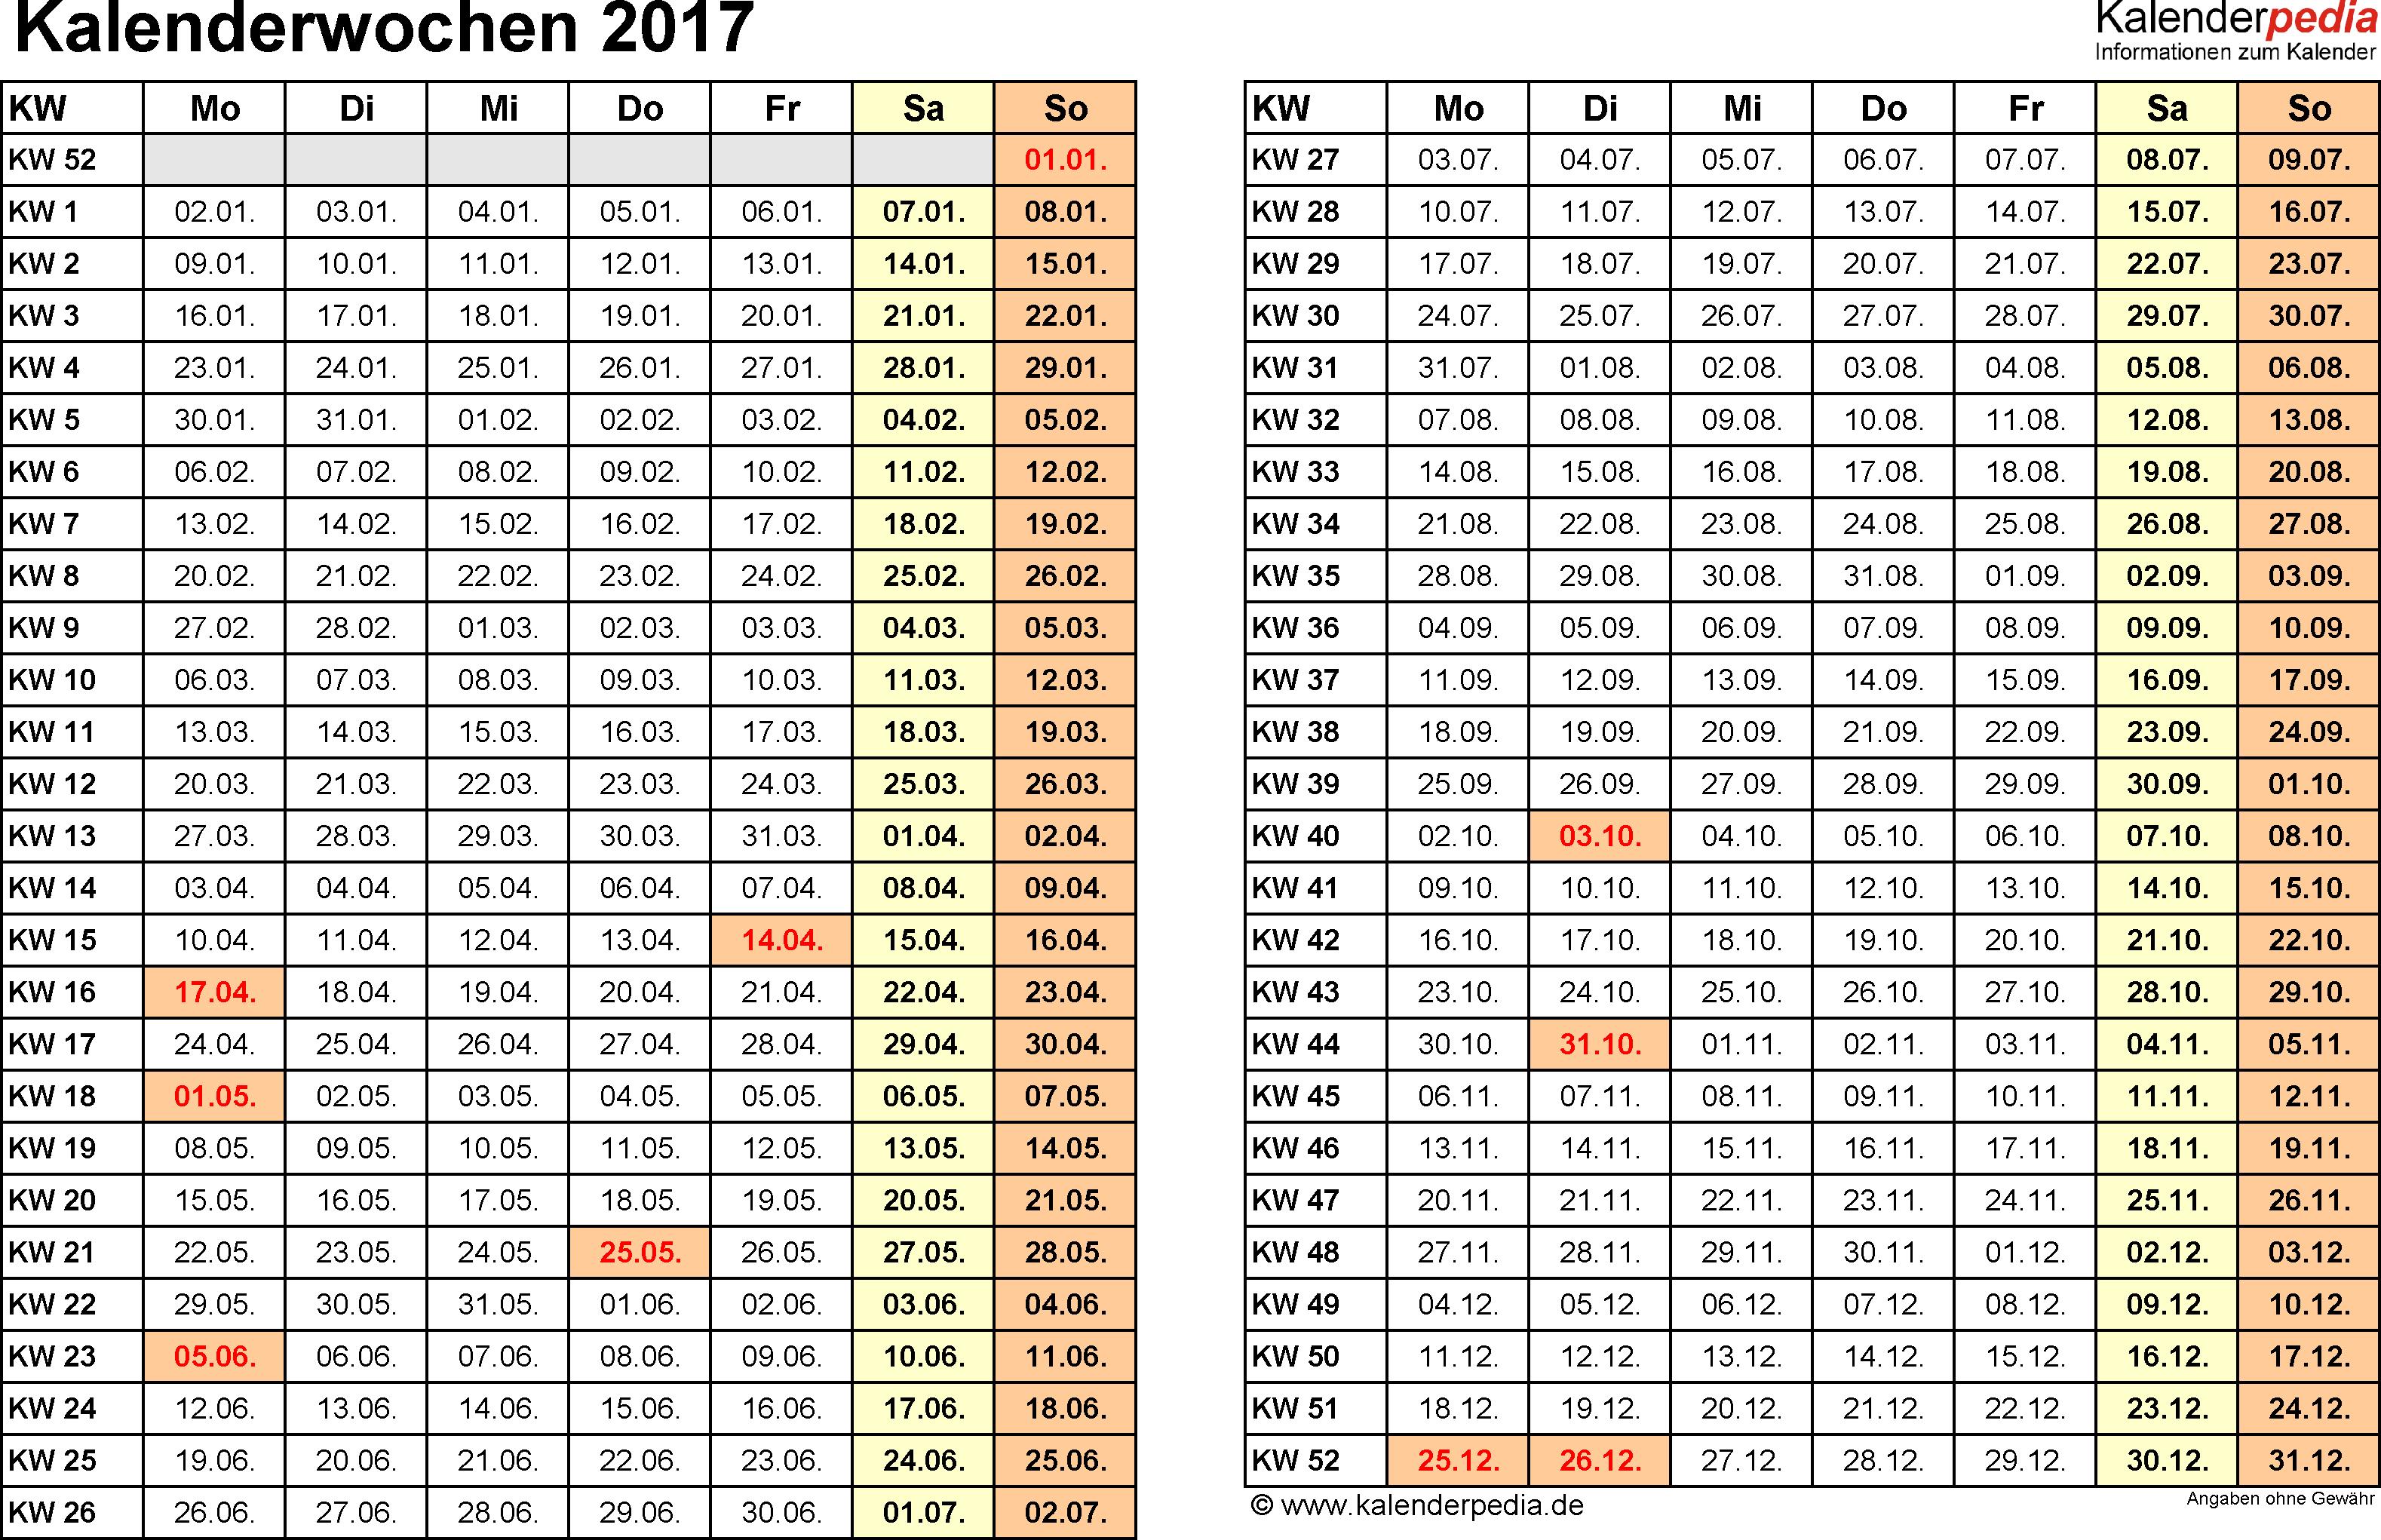 for three year calendar 2015/2016/2017 (landscape orientation, 1 page ...